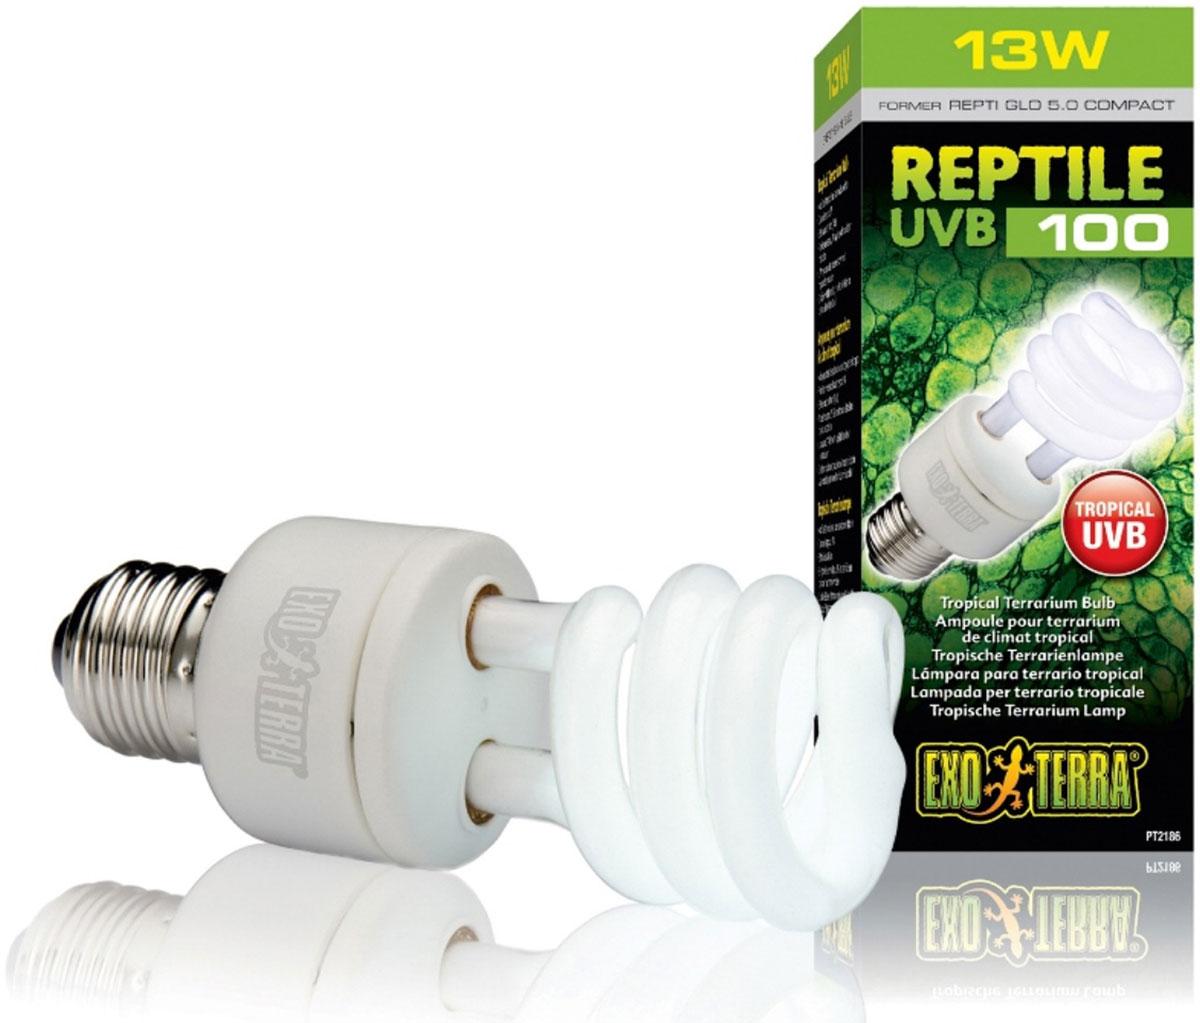 Лампа Exo Terra Repti Glo 5.0 Compact, 13 Вт лампа repti zoo repti infrared 50вт инфракрасная r63050